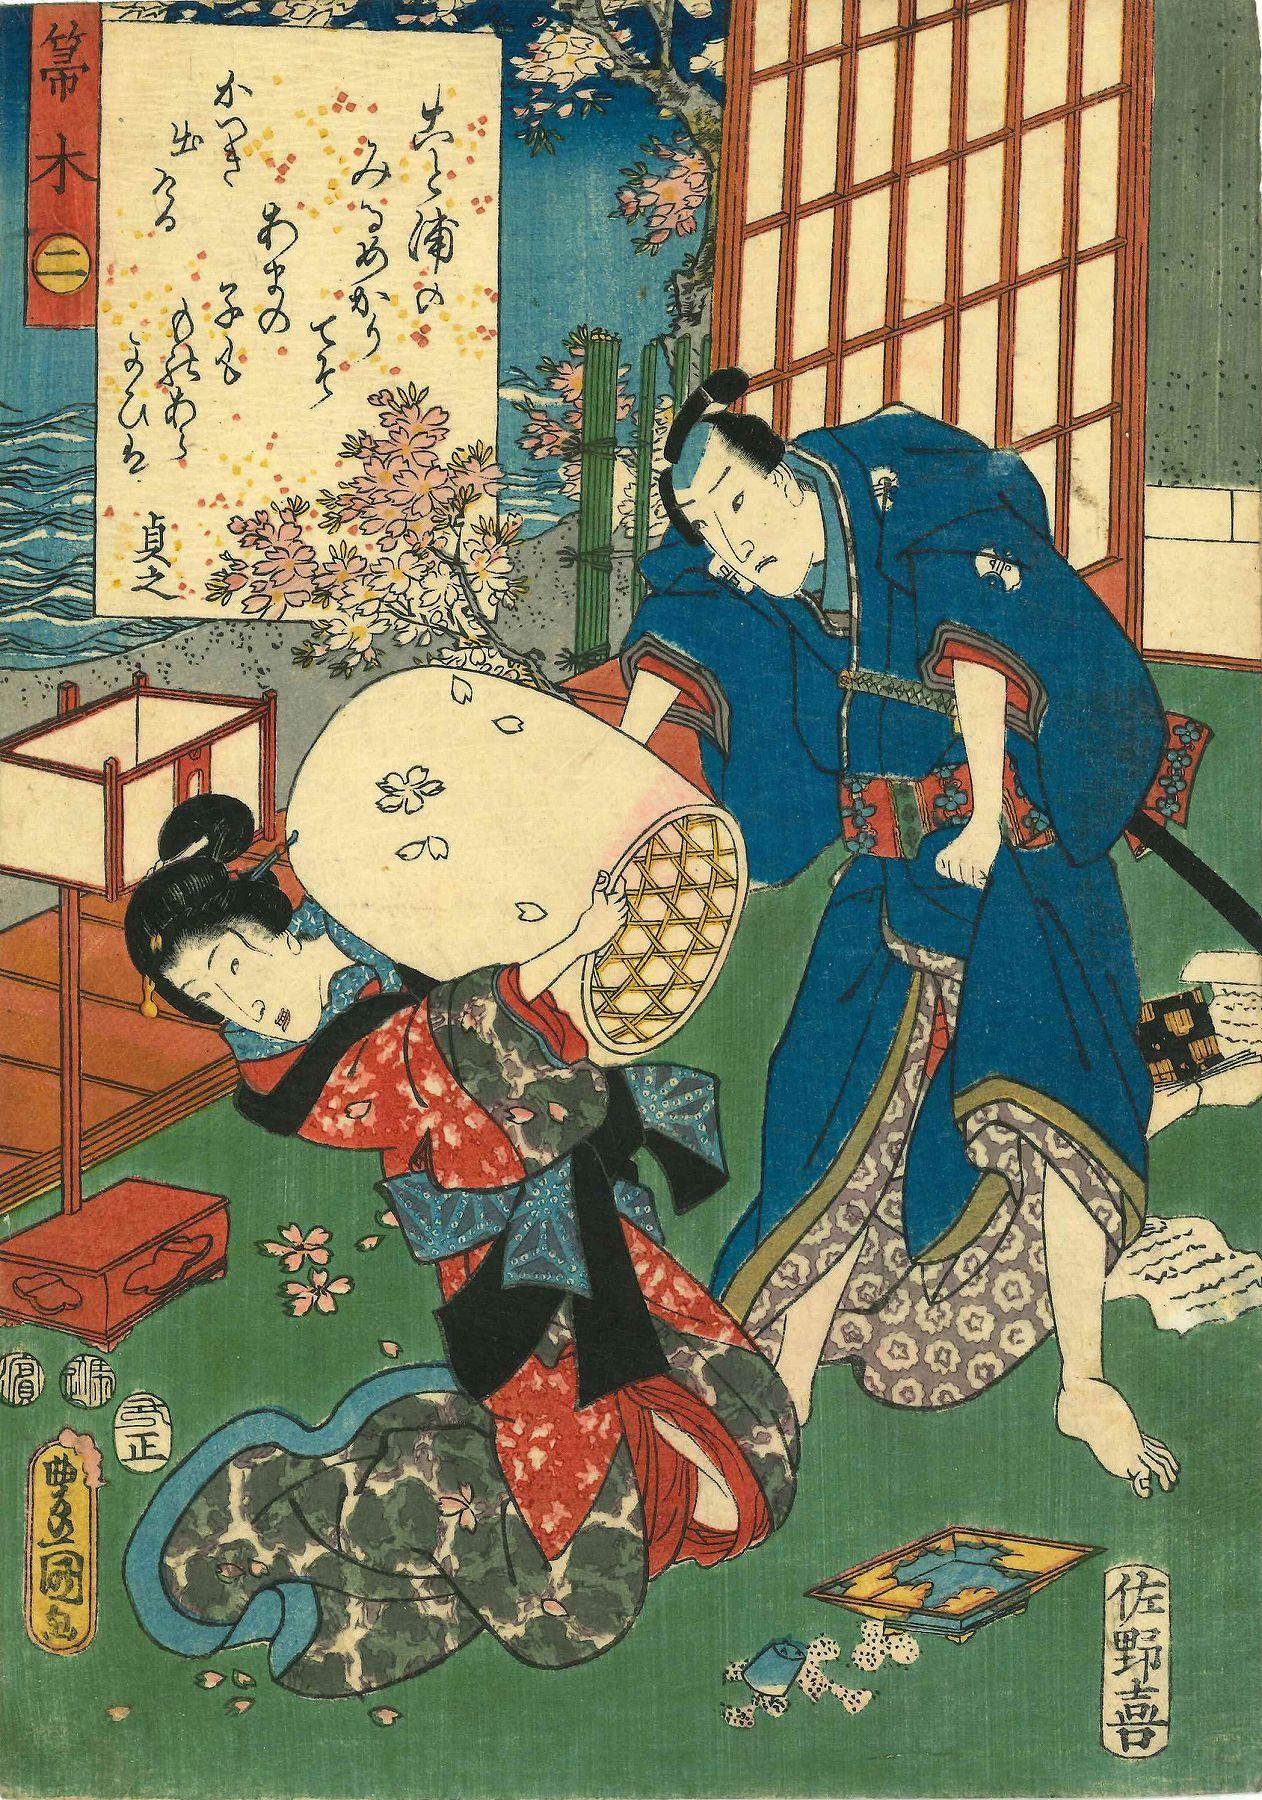 TOYOKUNI III Chapter 2, Hahakigi, from Genji monogatari (Tale of Genji)